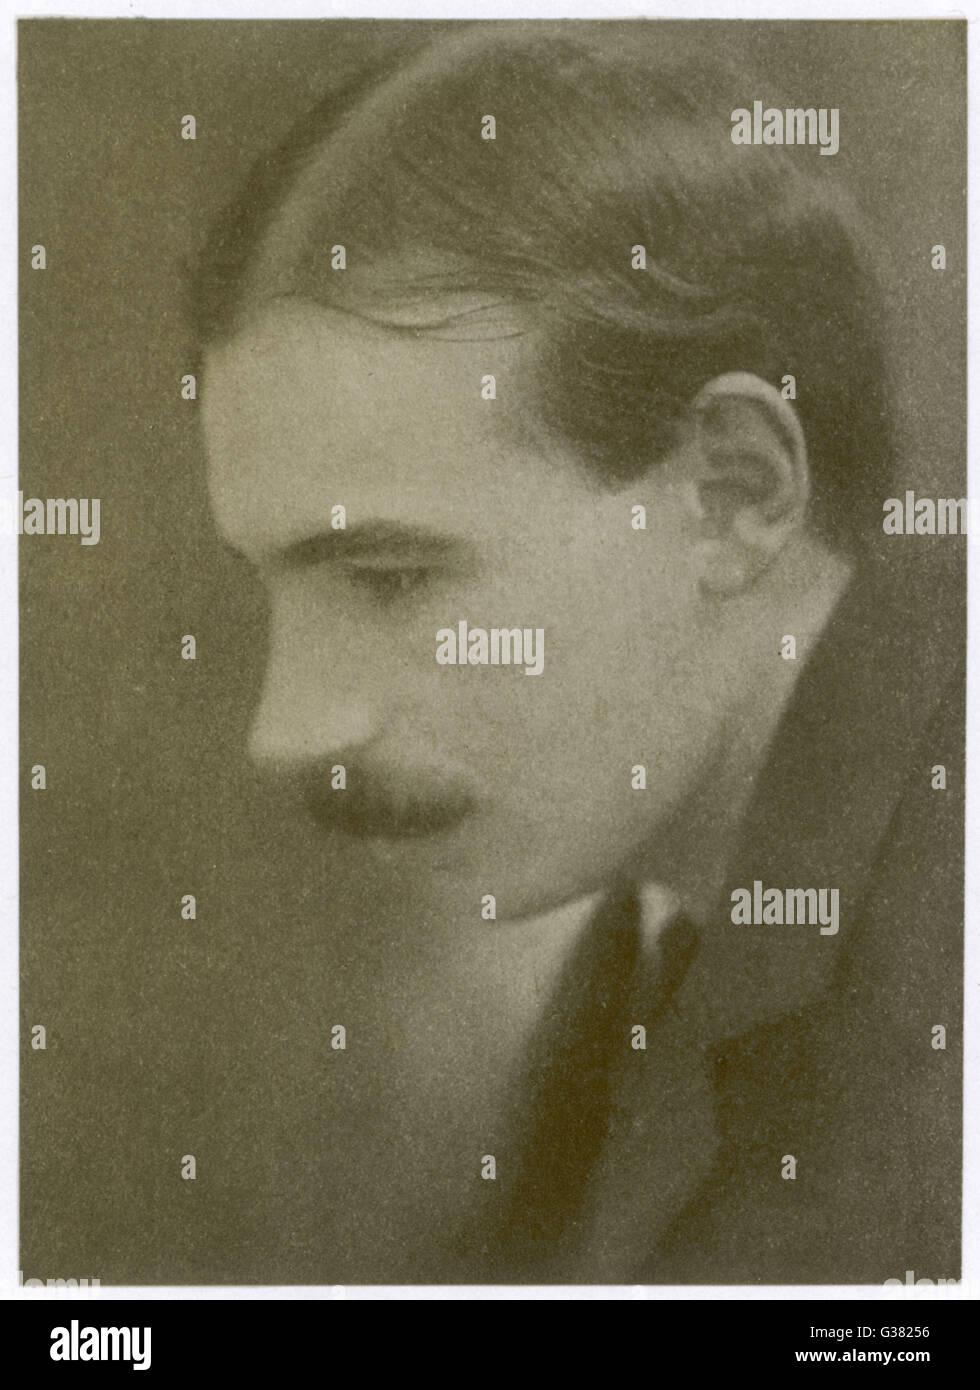 JOHN MAYNARD KEYNES  Economist        Date: 1883 - 1946 - Stock Image